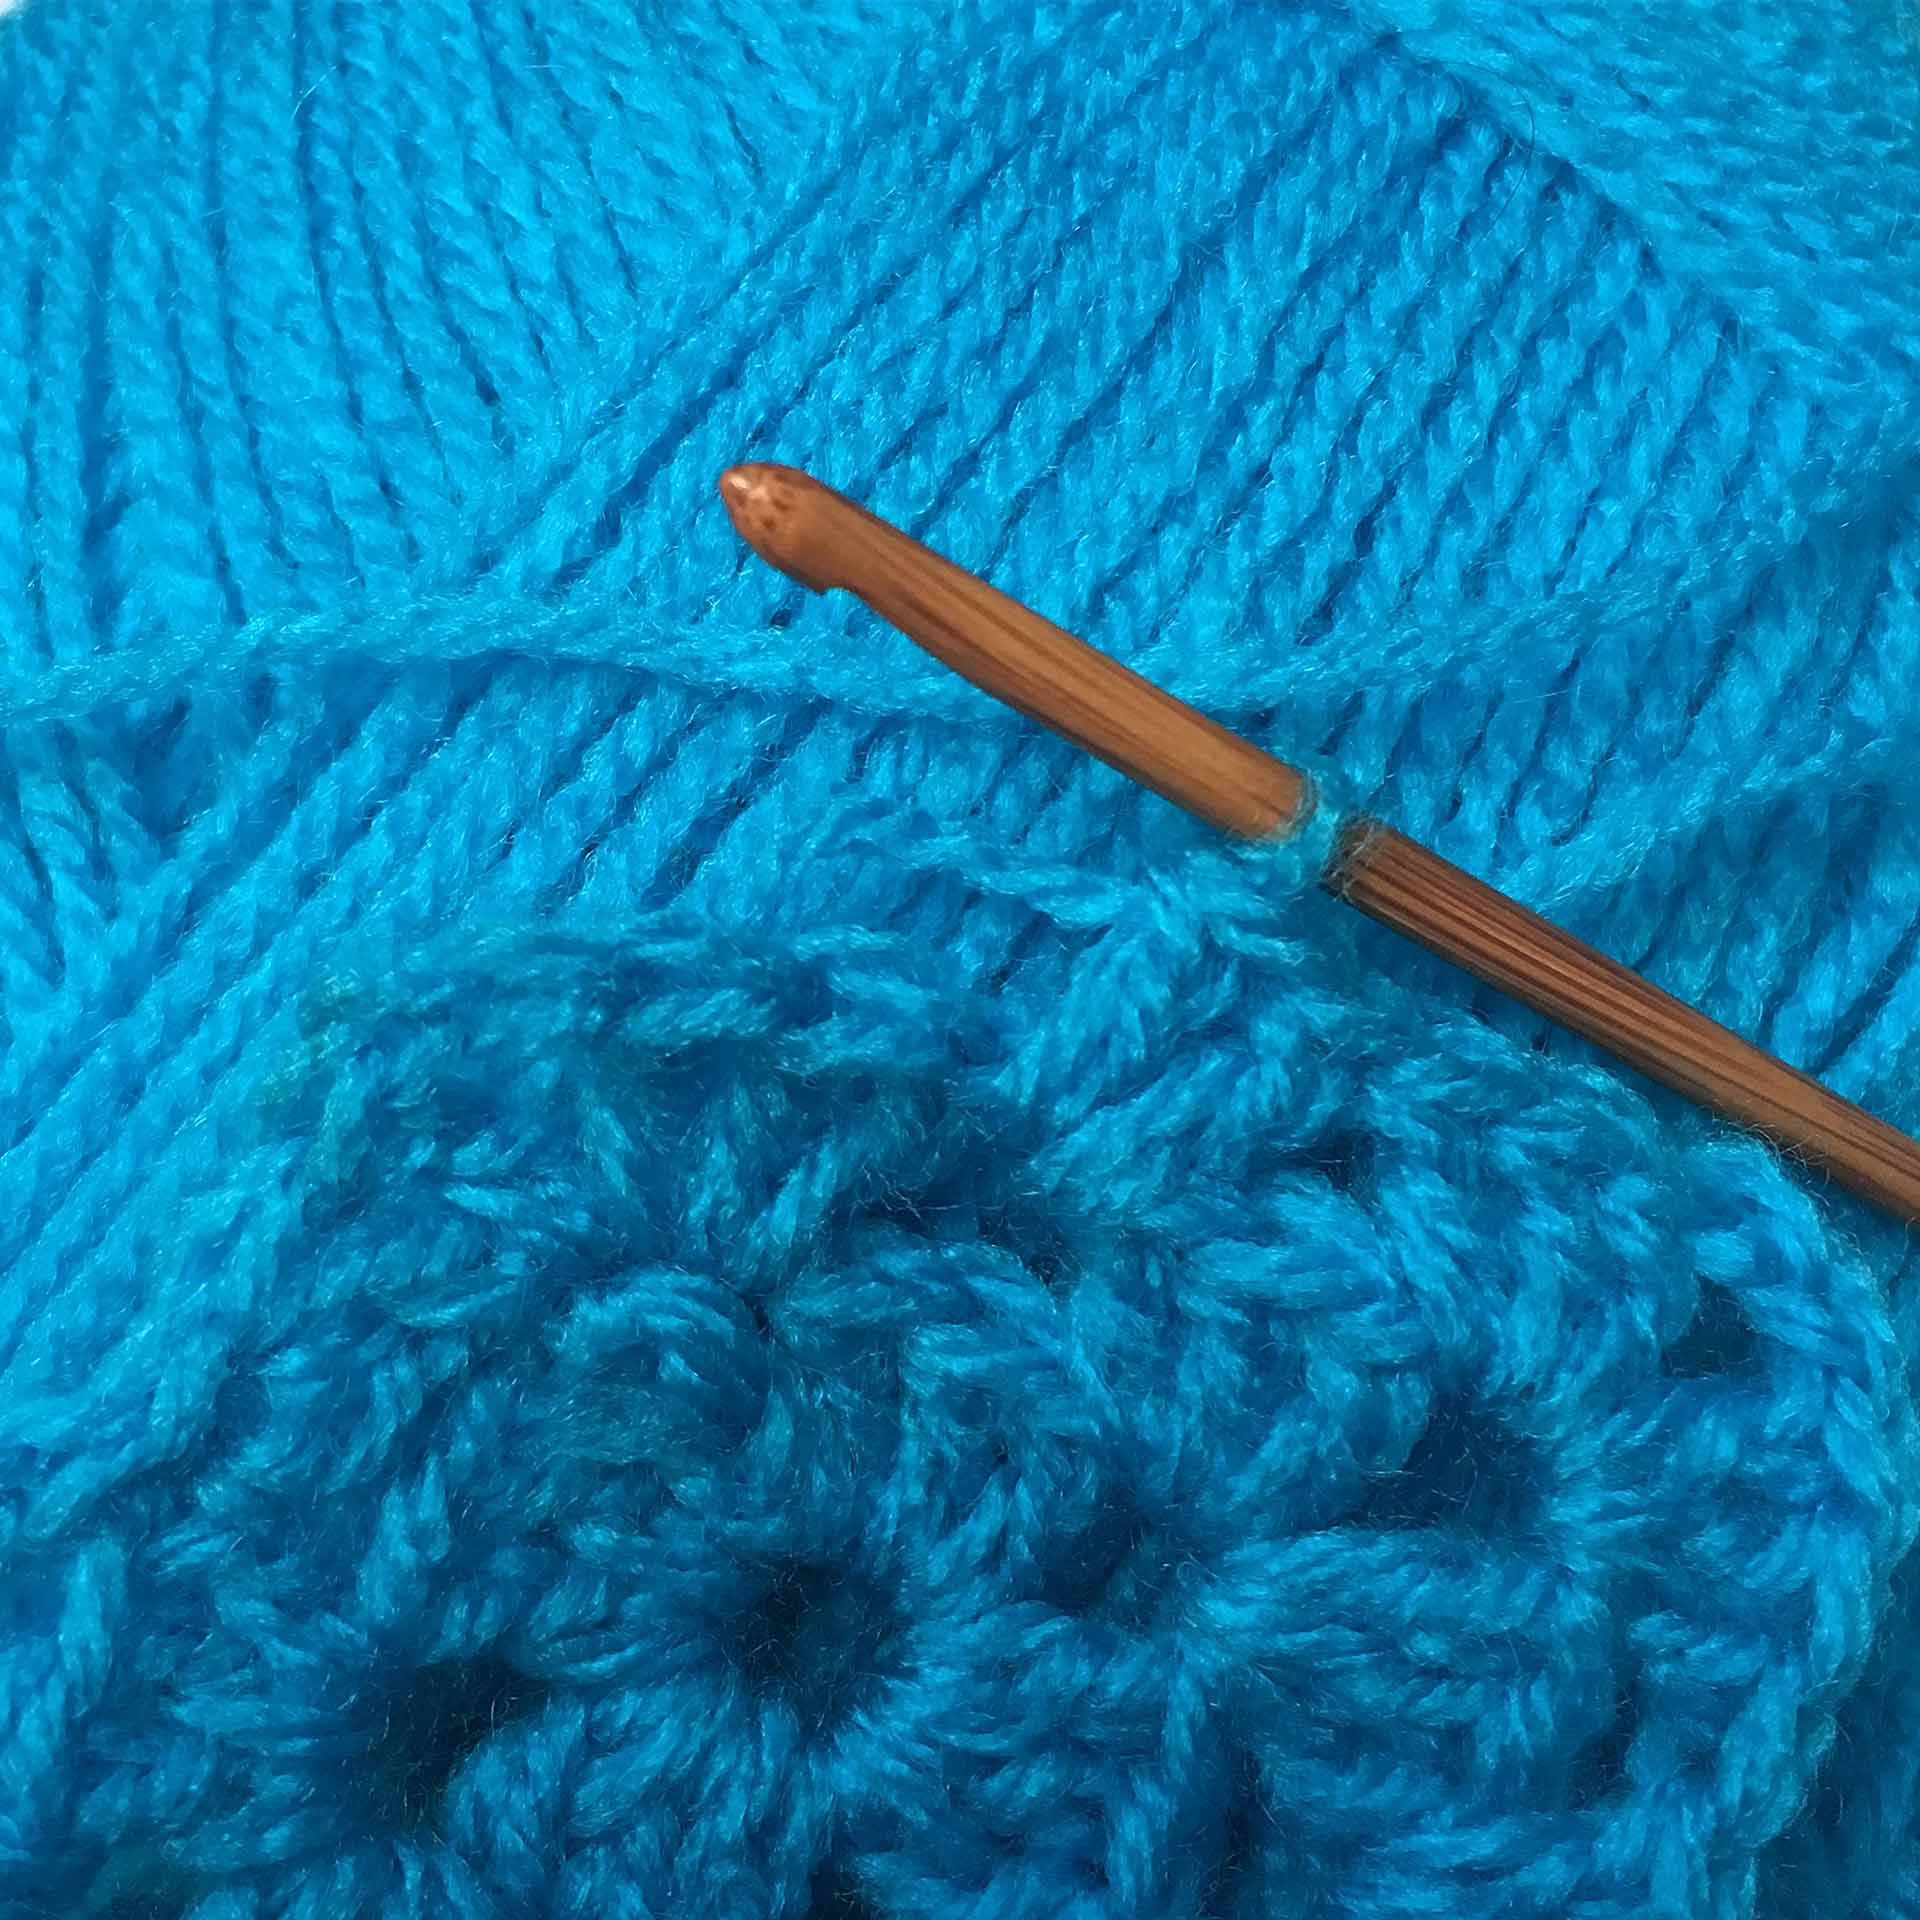 New blue wool